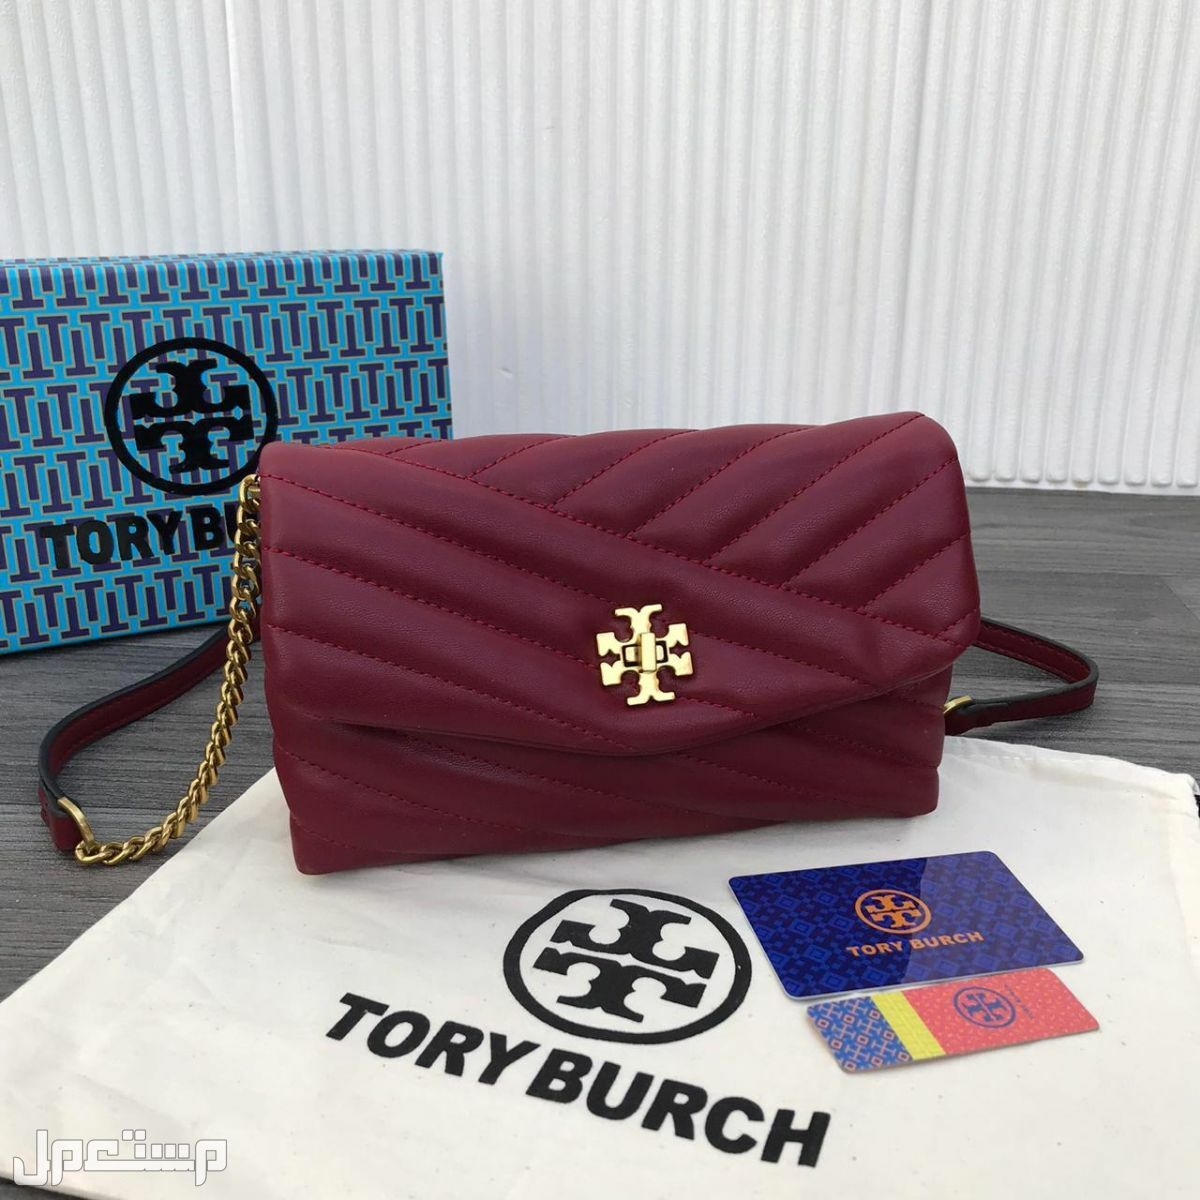 شنط حقائب TORY BURCH جملة وتجزئه